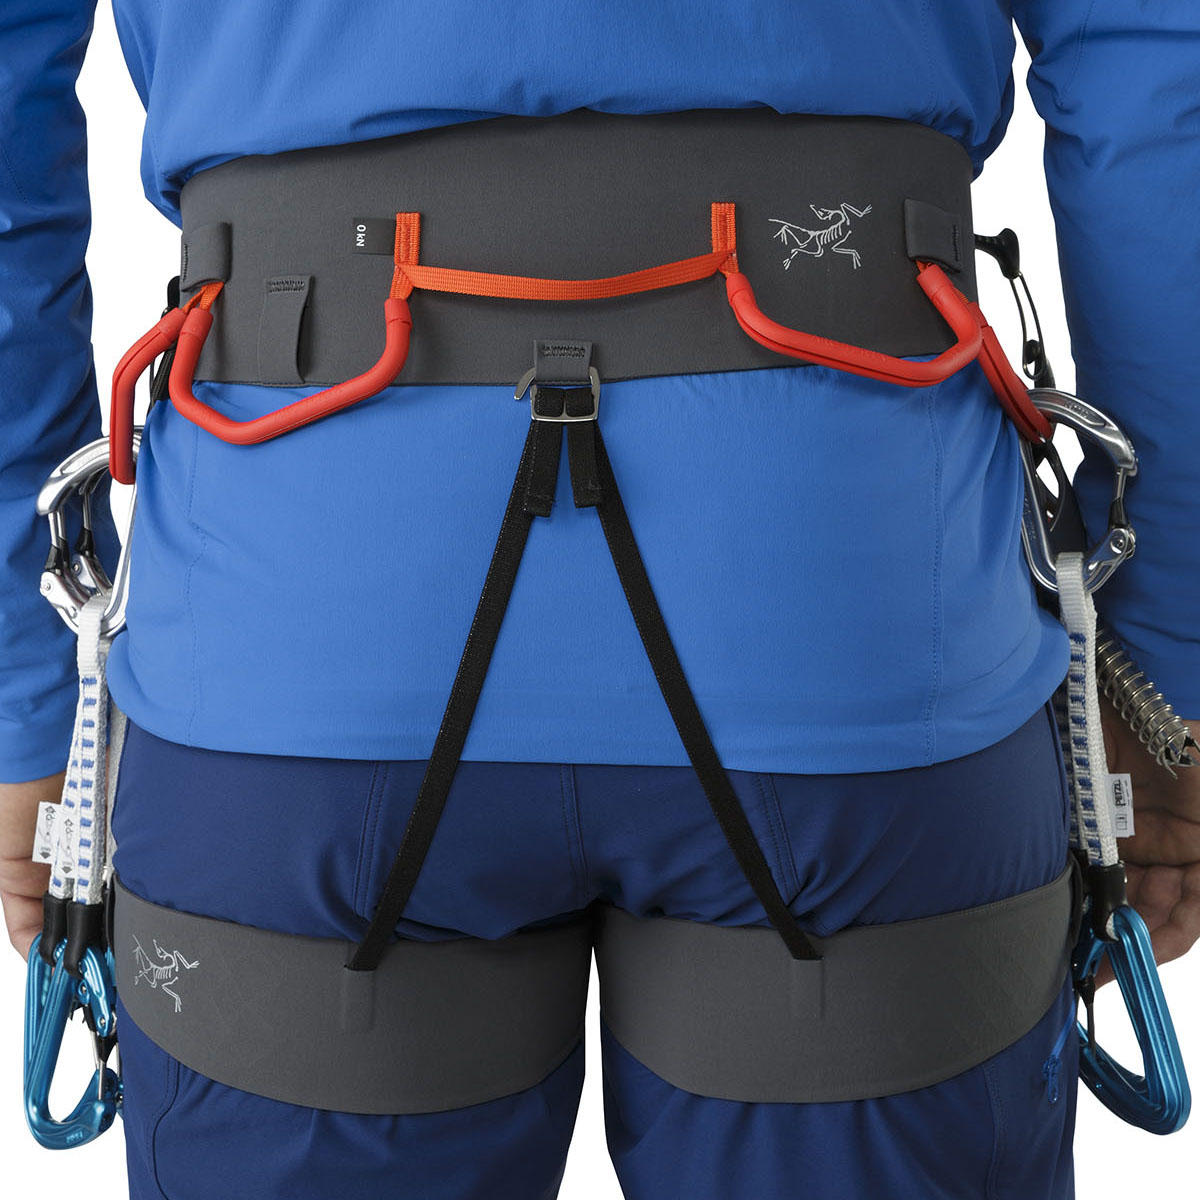 feb727992e6 Arc'teryx AR-395a Harness Men's | Harnesses | EpicTV Shop